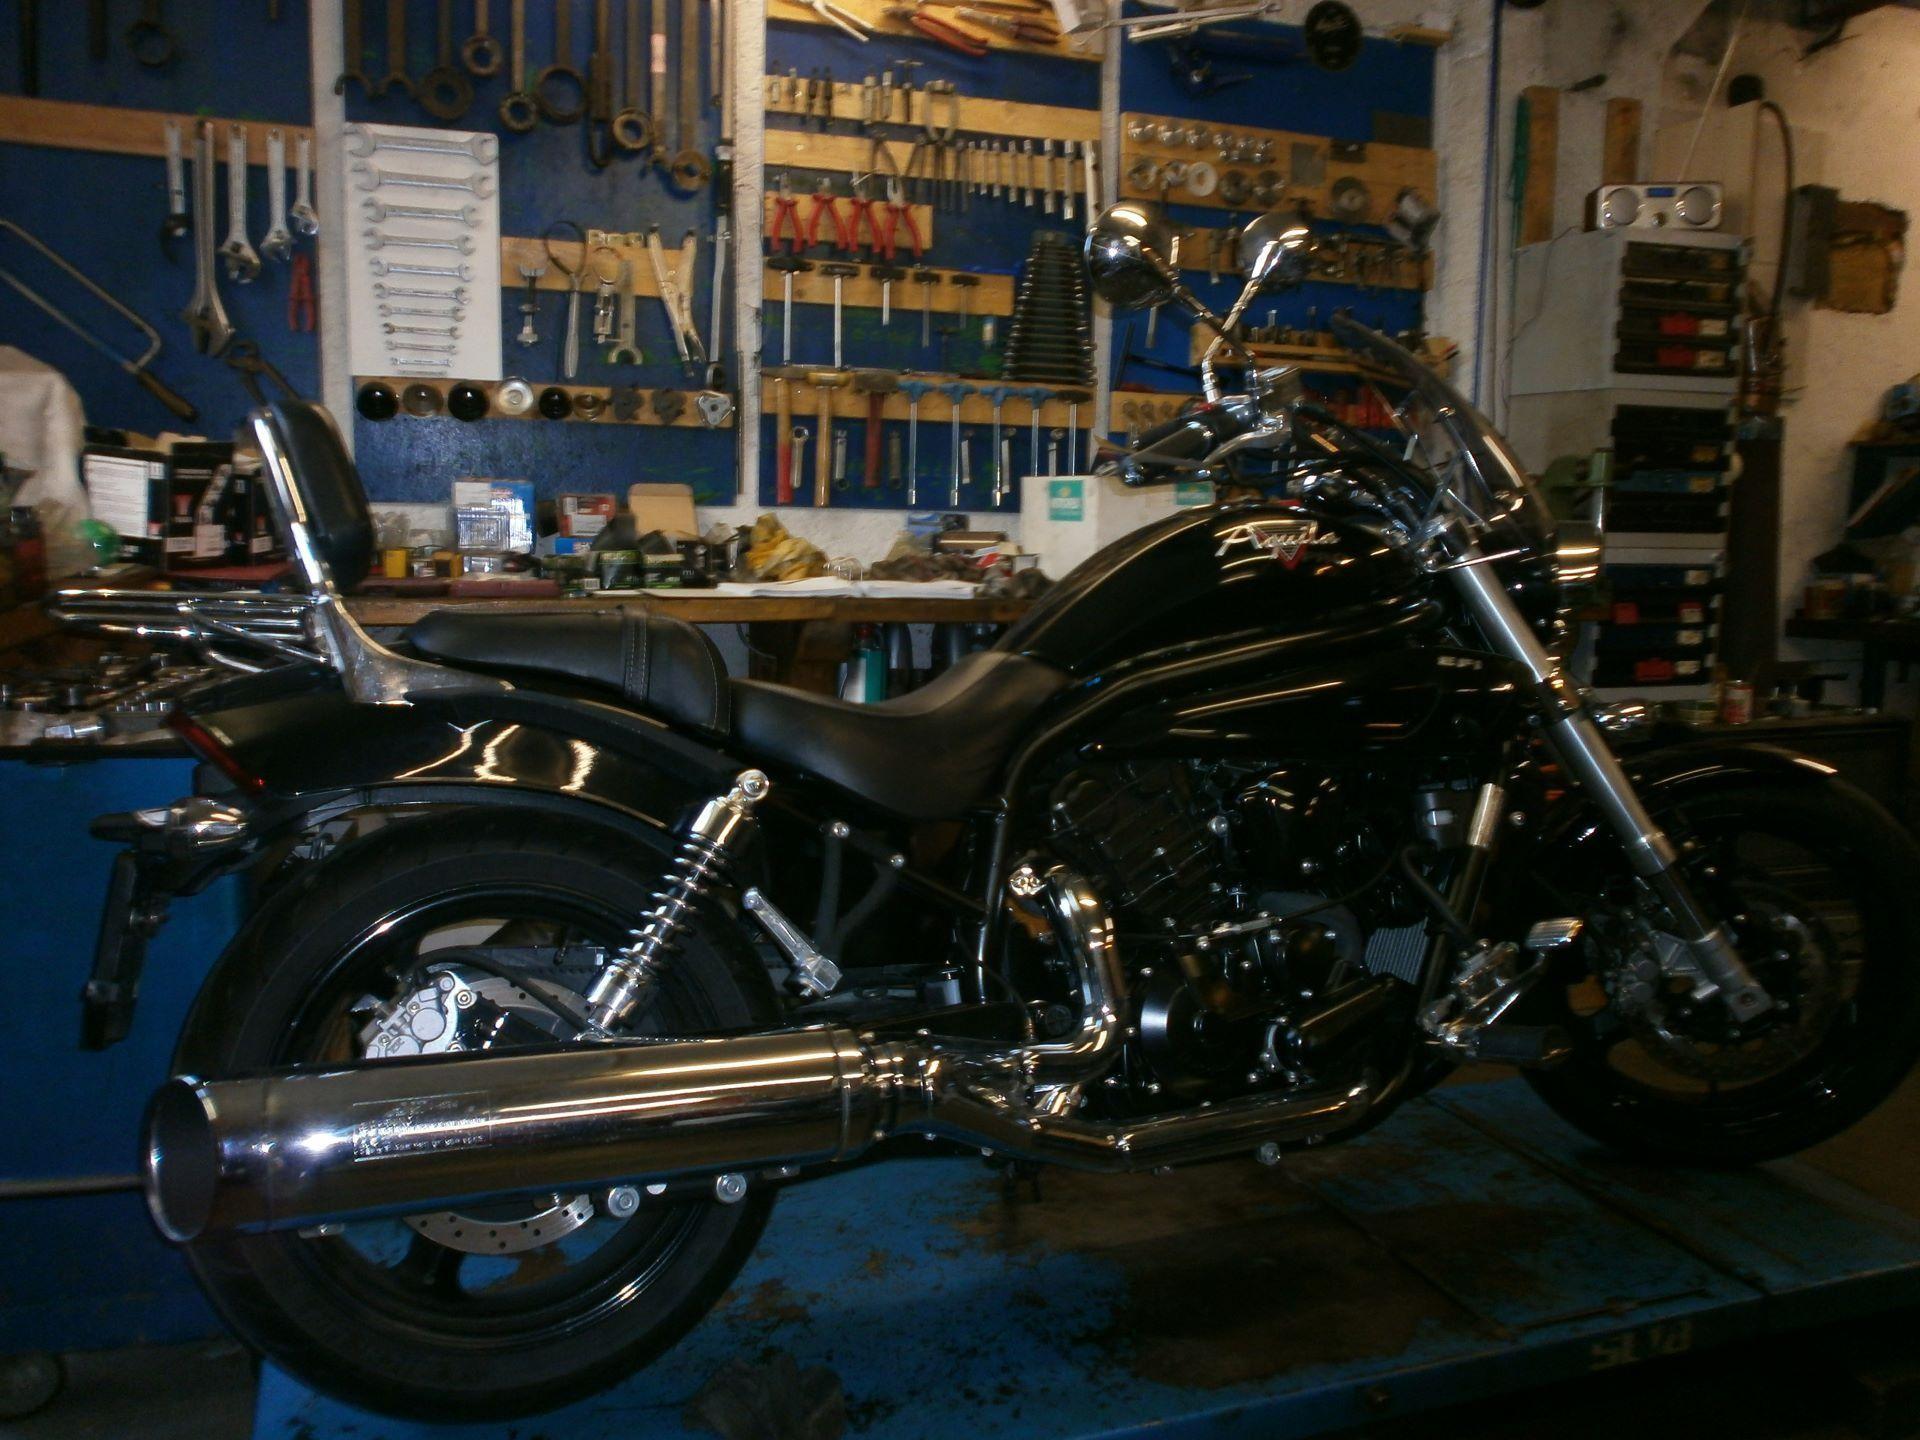 moto occasions acheter hyosung aquila 650 w thrich motos courrendlin. Black Bedroom Furniture Sets. Home Design Ideas